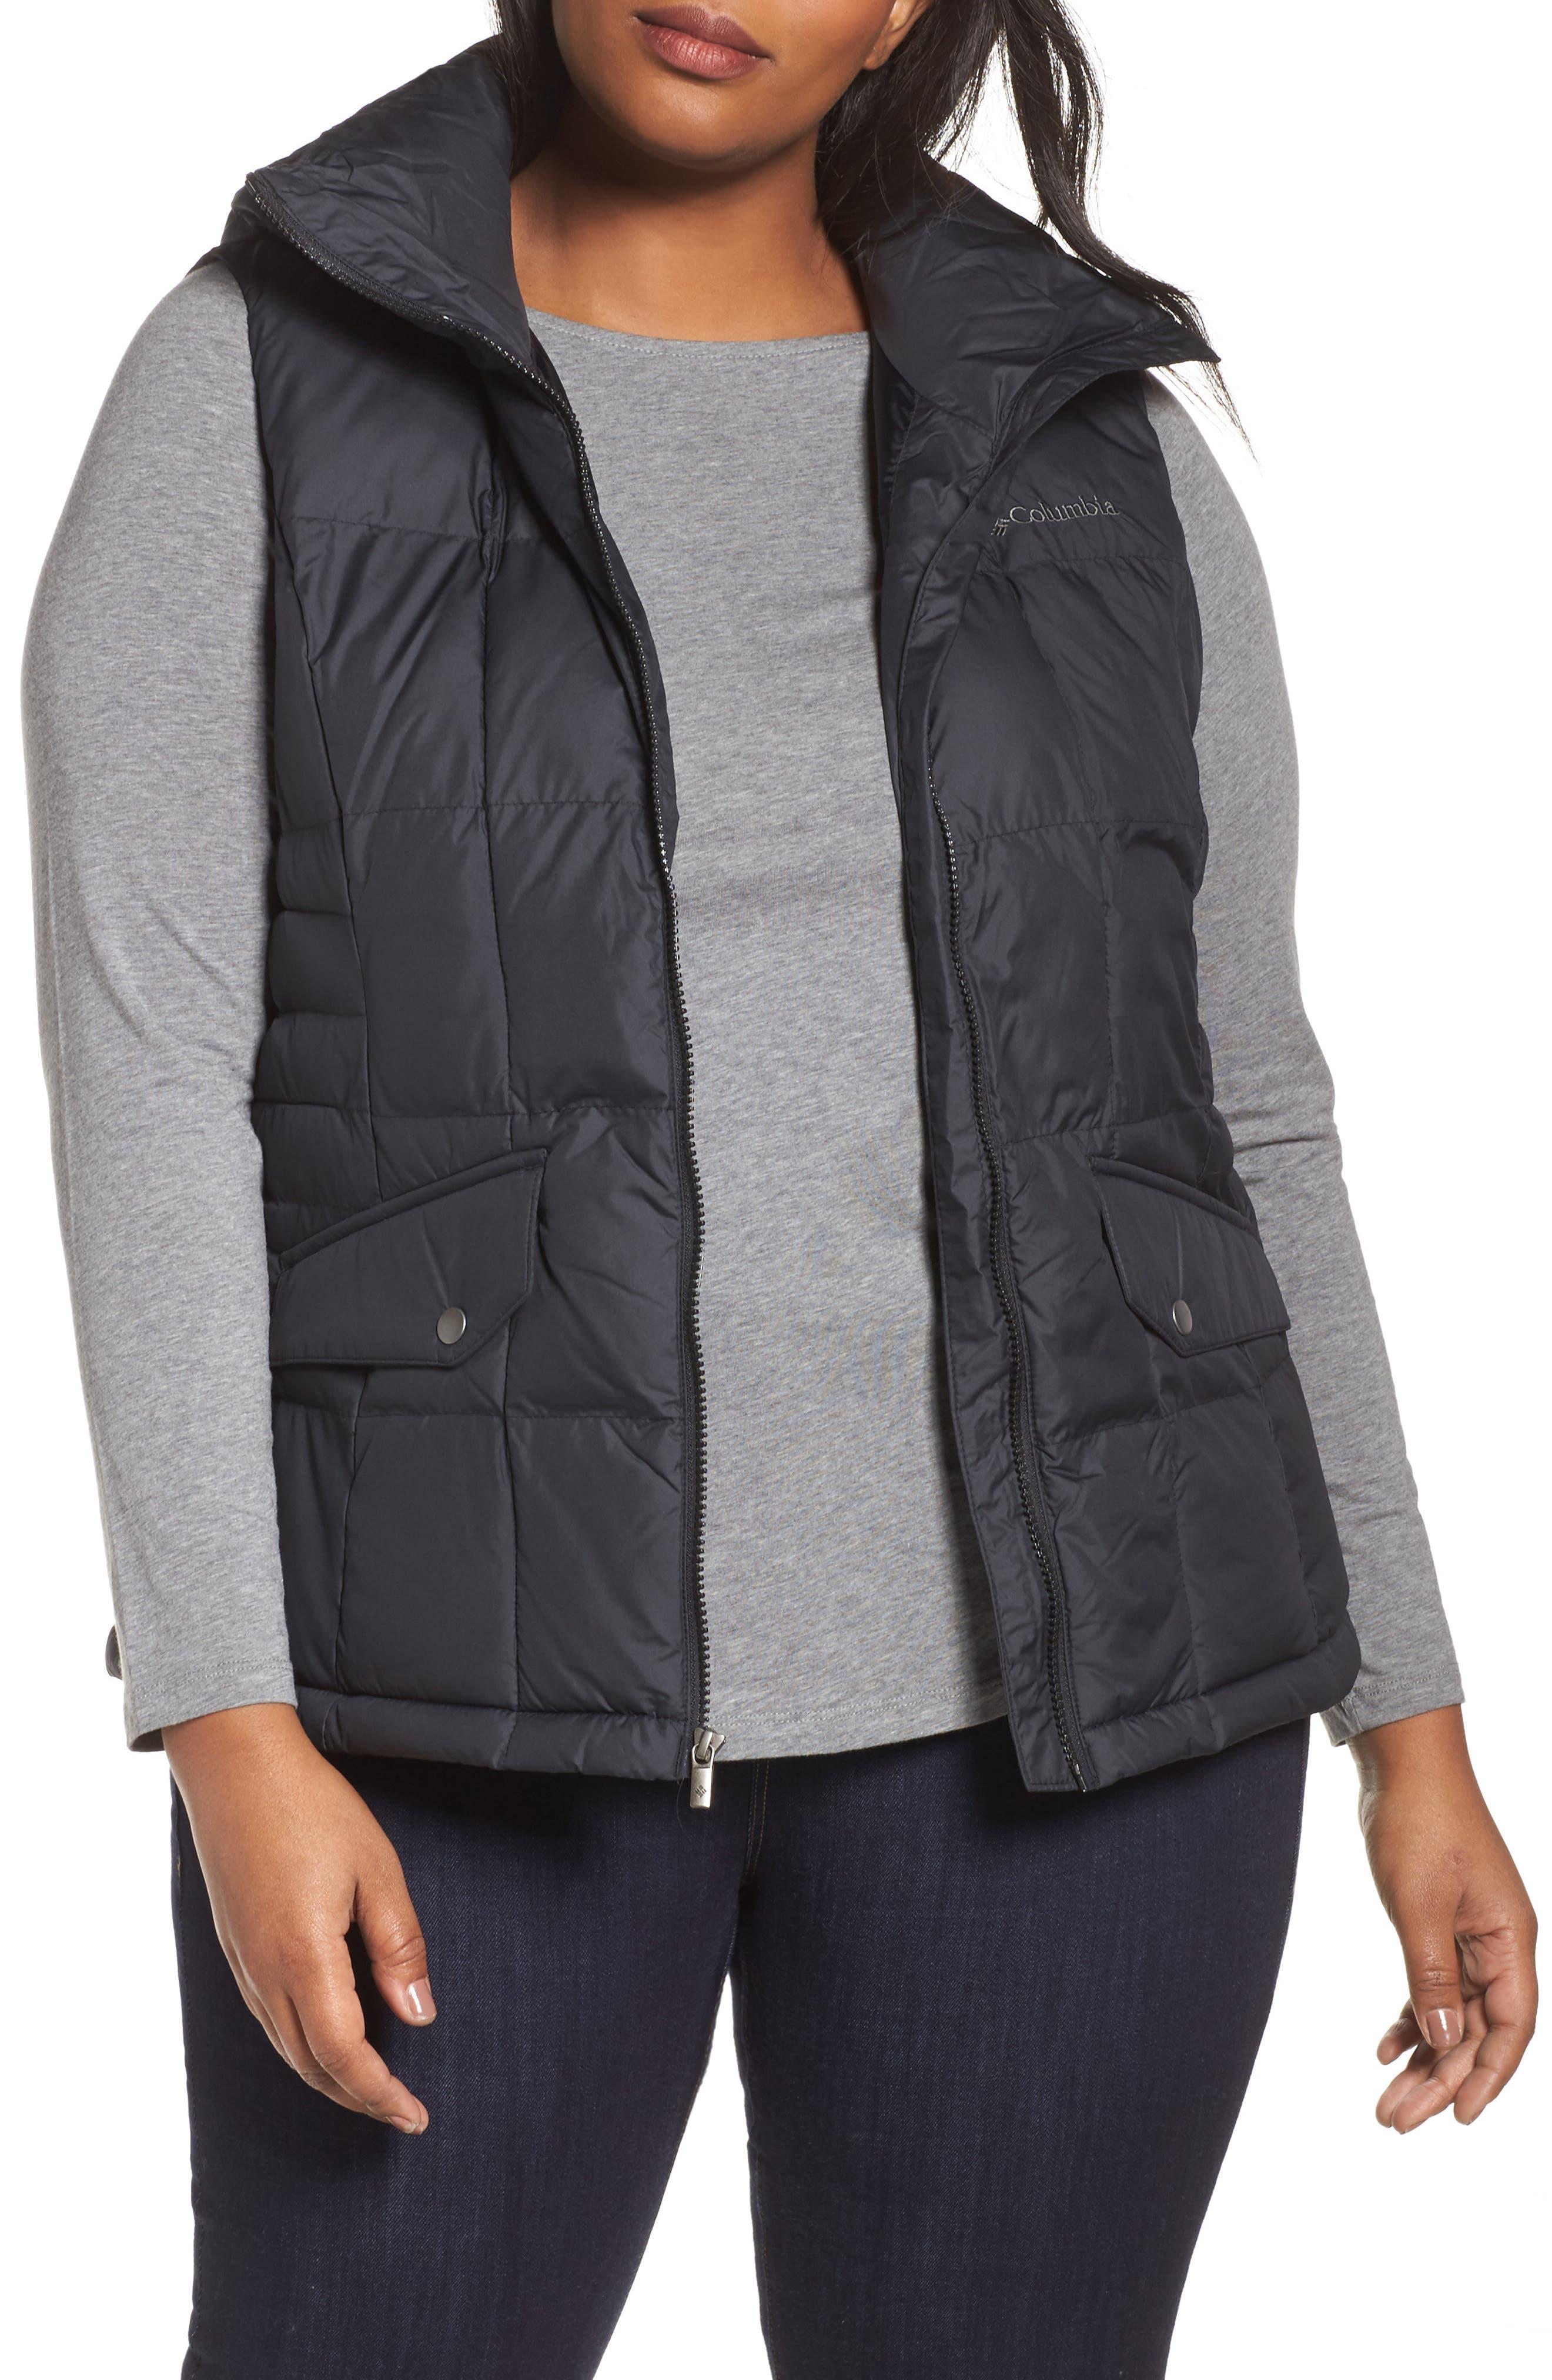 Lone Creek Puffer Vest,                         Main,                         color, Black